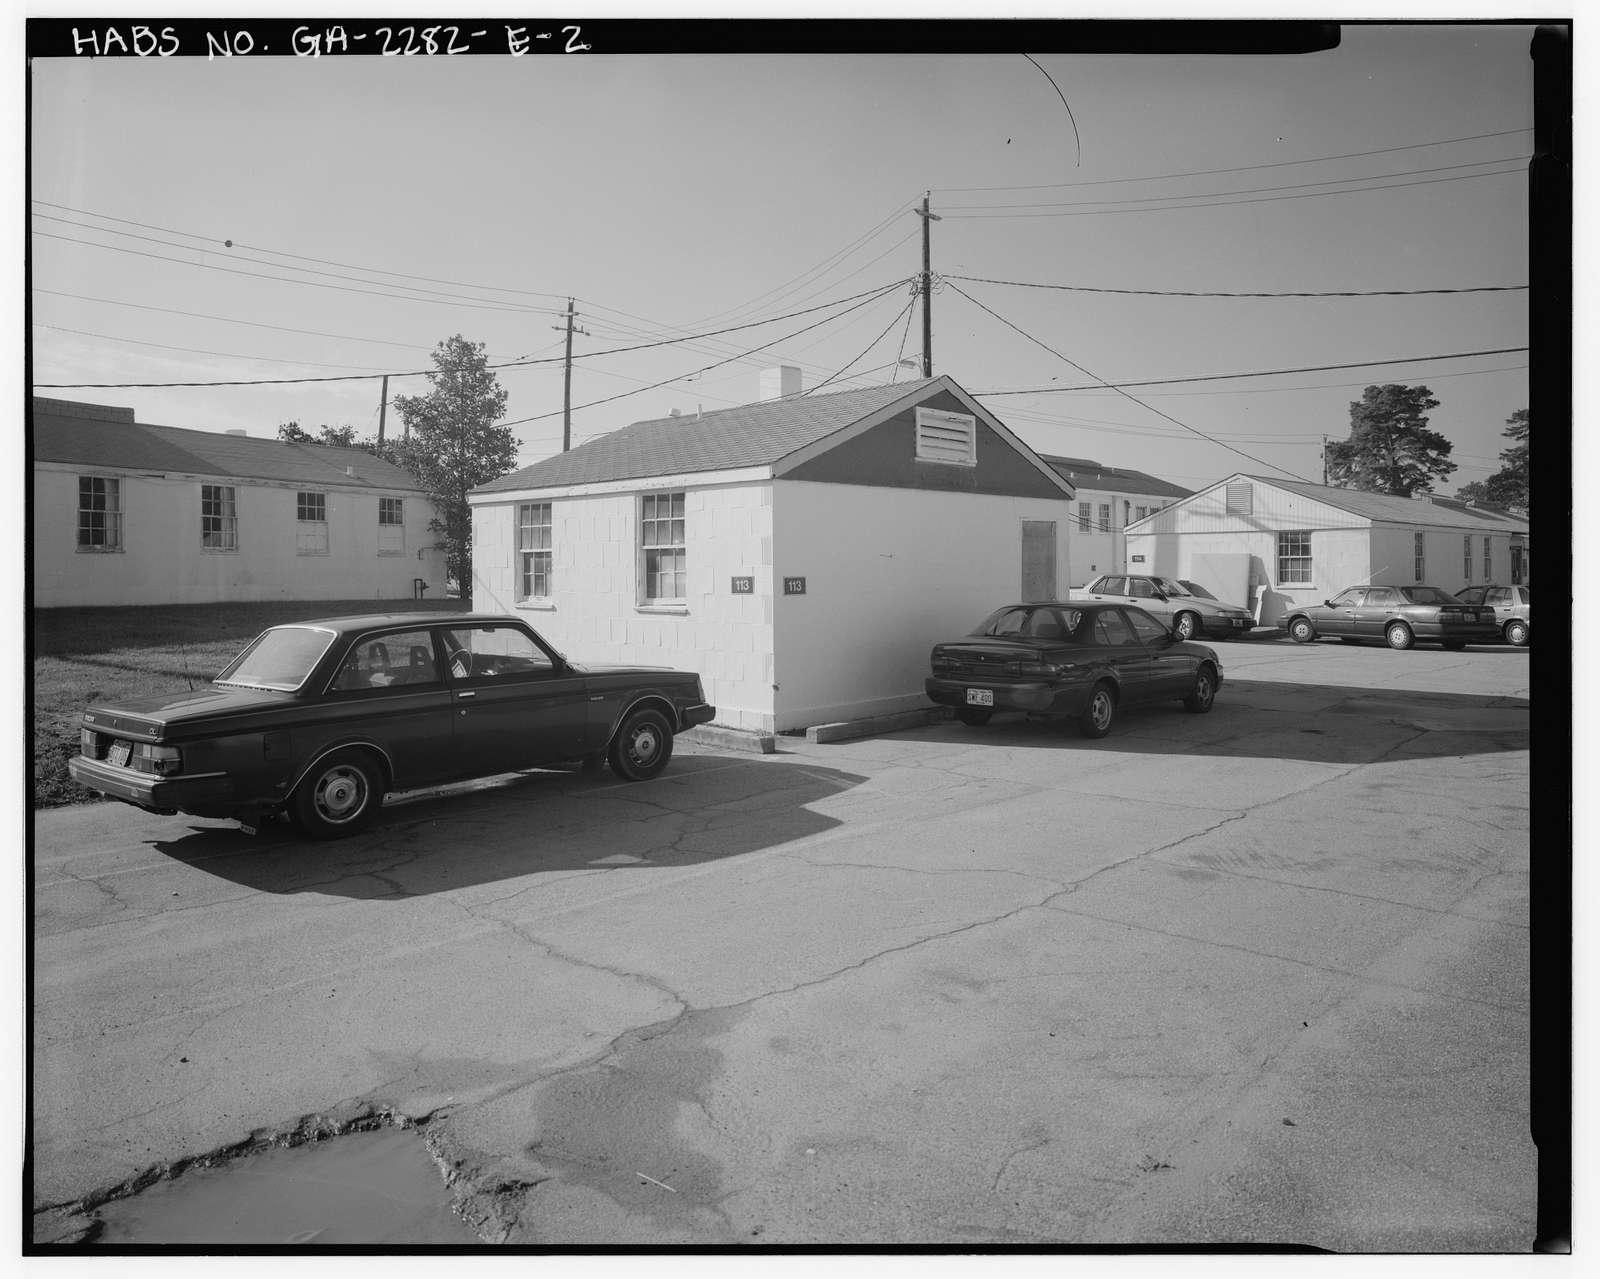 Fort McPherson, World War II Station Hospital, G. U. Treatment Unit Lavatory, Thorne & Hood Avenues, Atlanta, Fulton County, GA